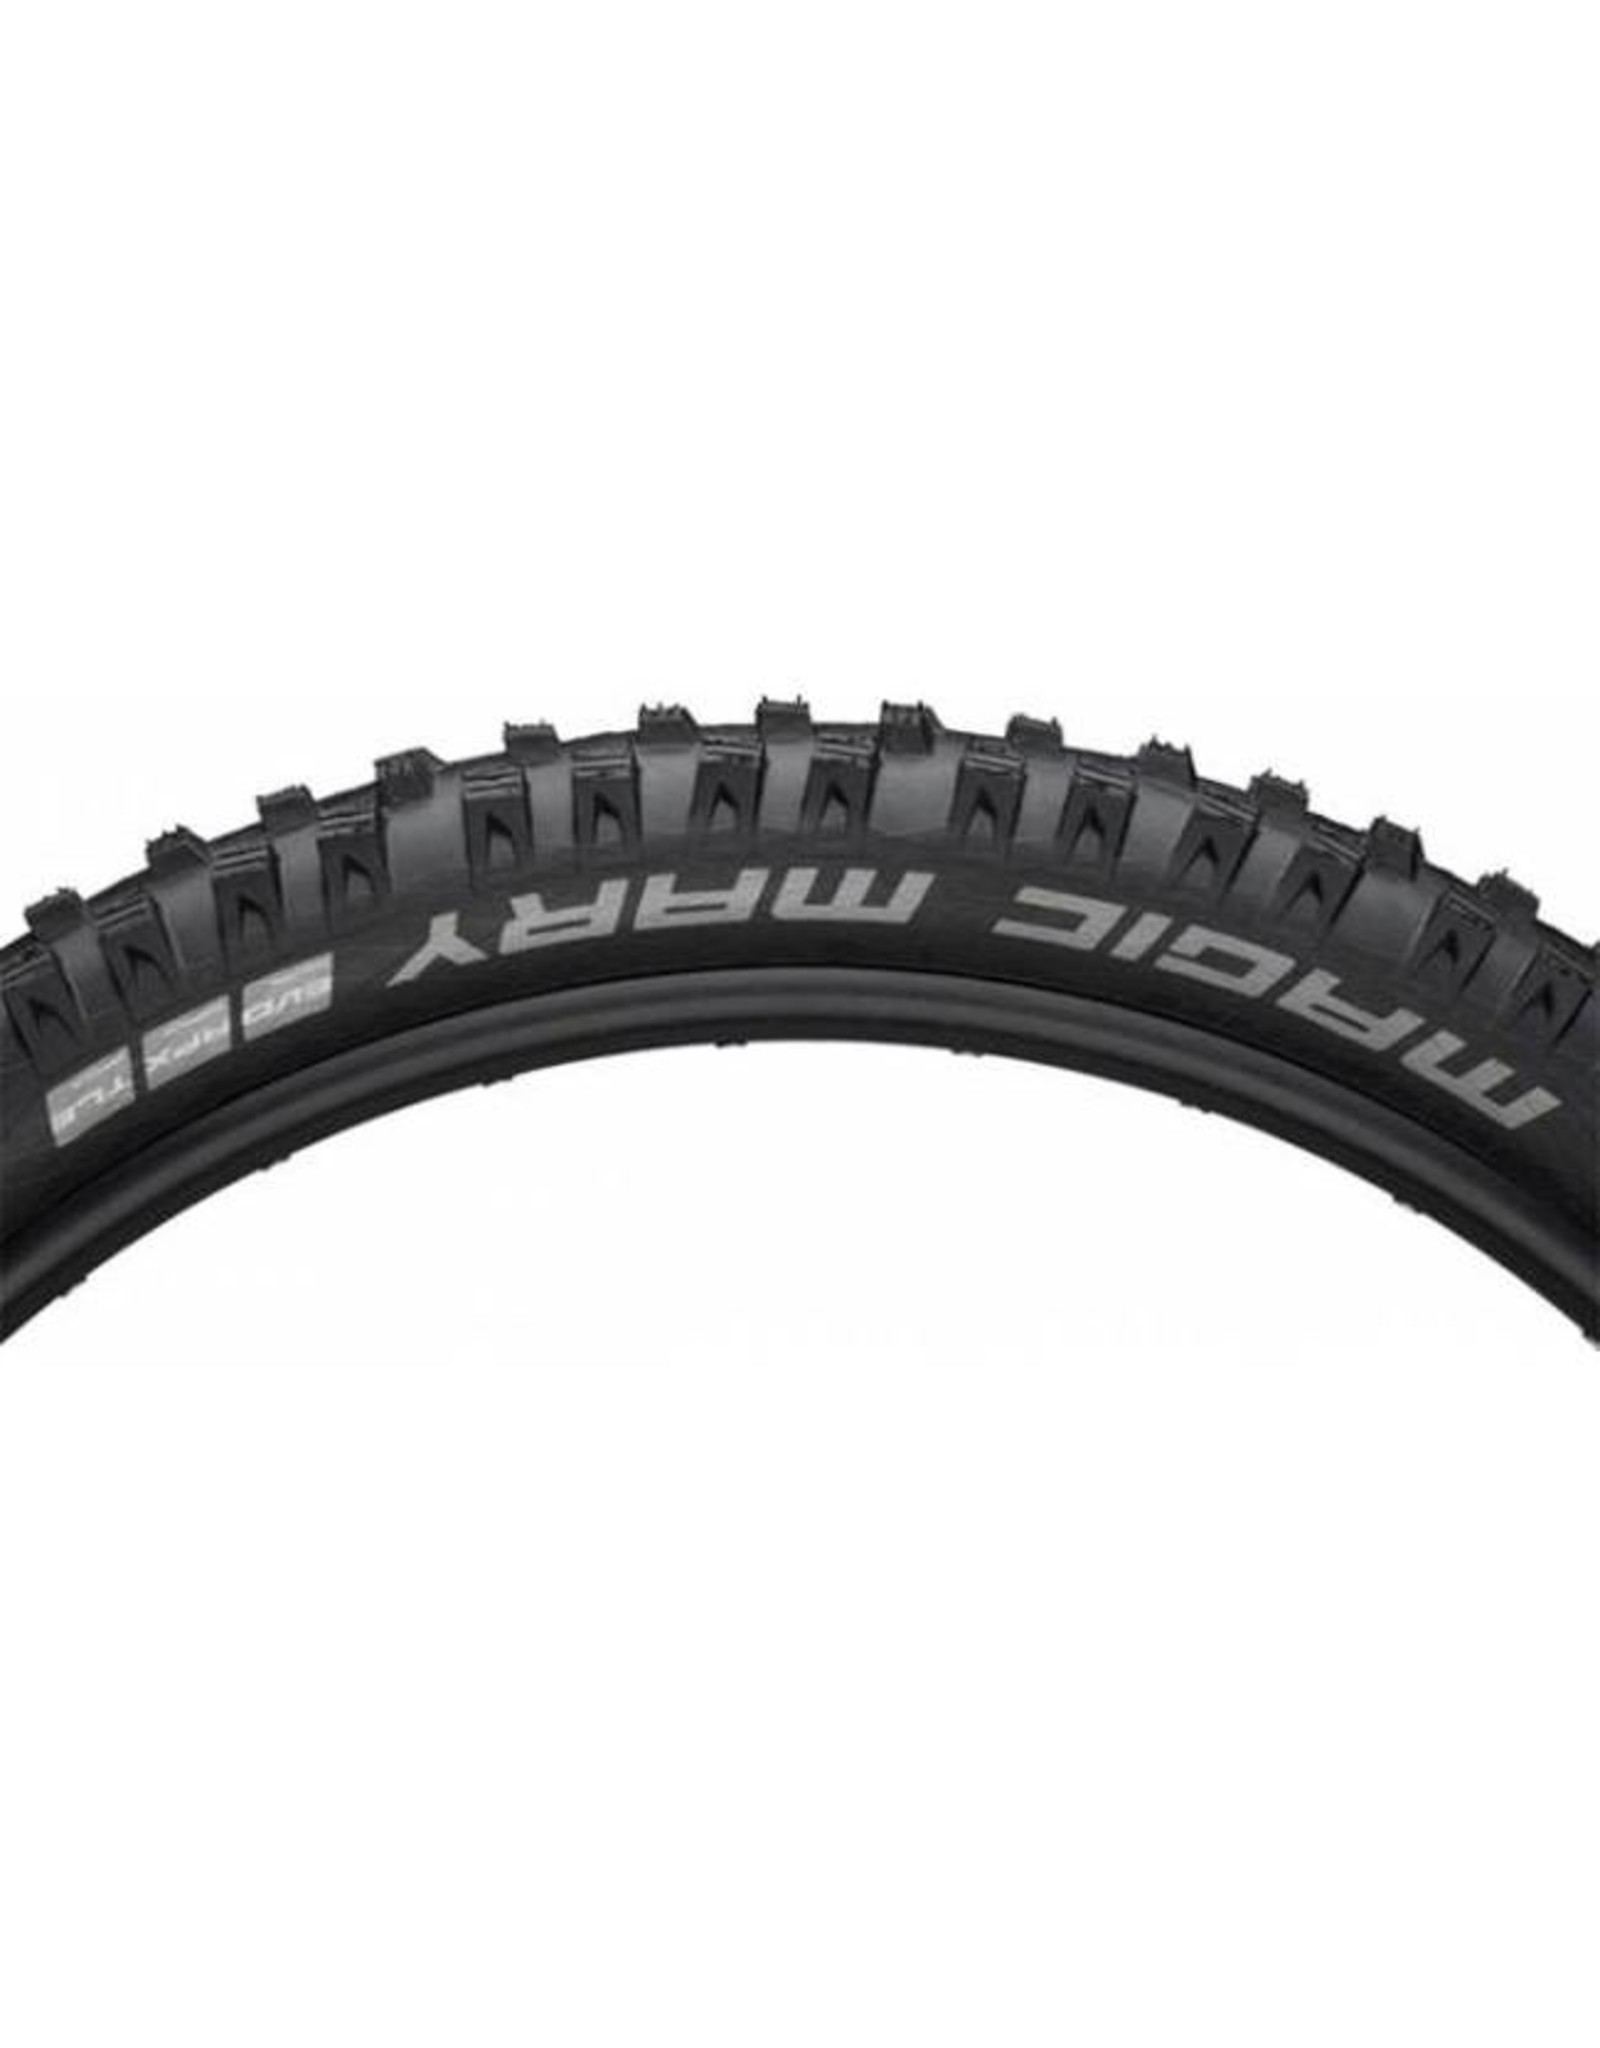 "Schwalbe Schwalbe Magic Mary Tire: 27.5 x 2.80"", Folding Bead, Evolution Line, Addix Soft Compound, SnakeSkin, Tubeless Easy, Apex, Black"